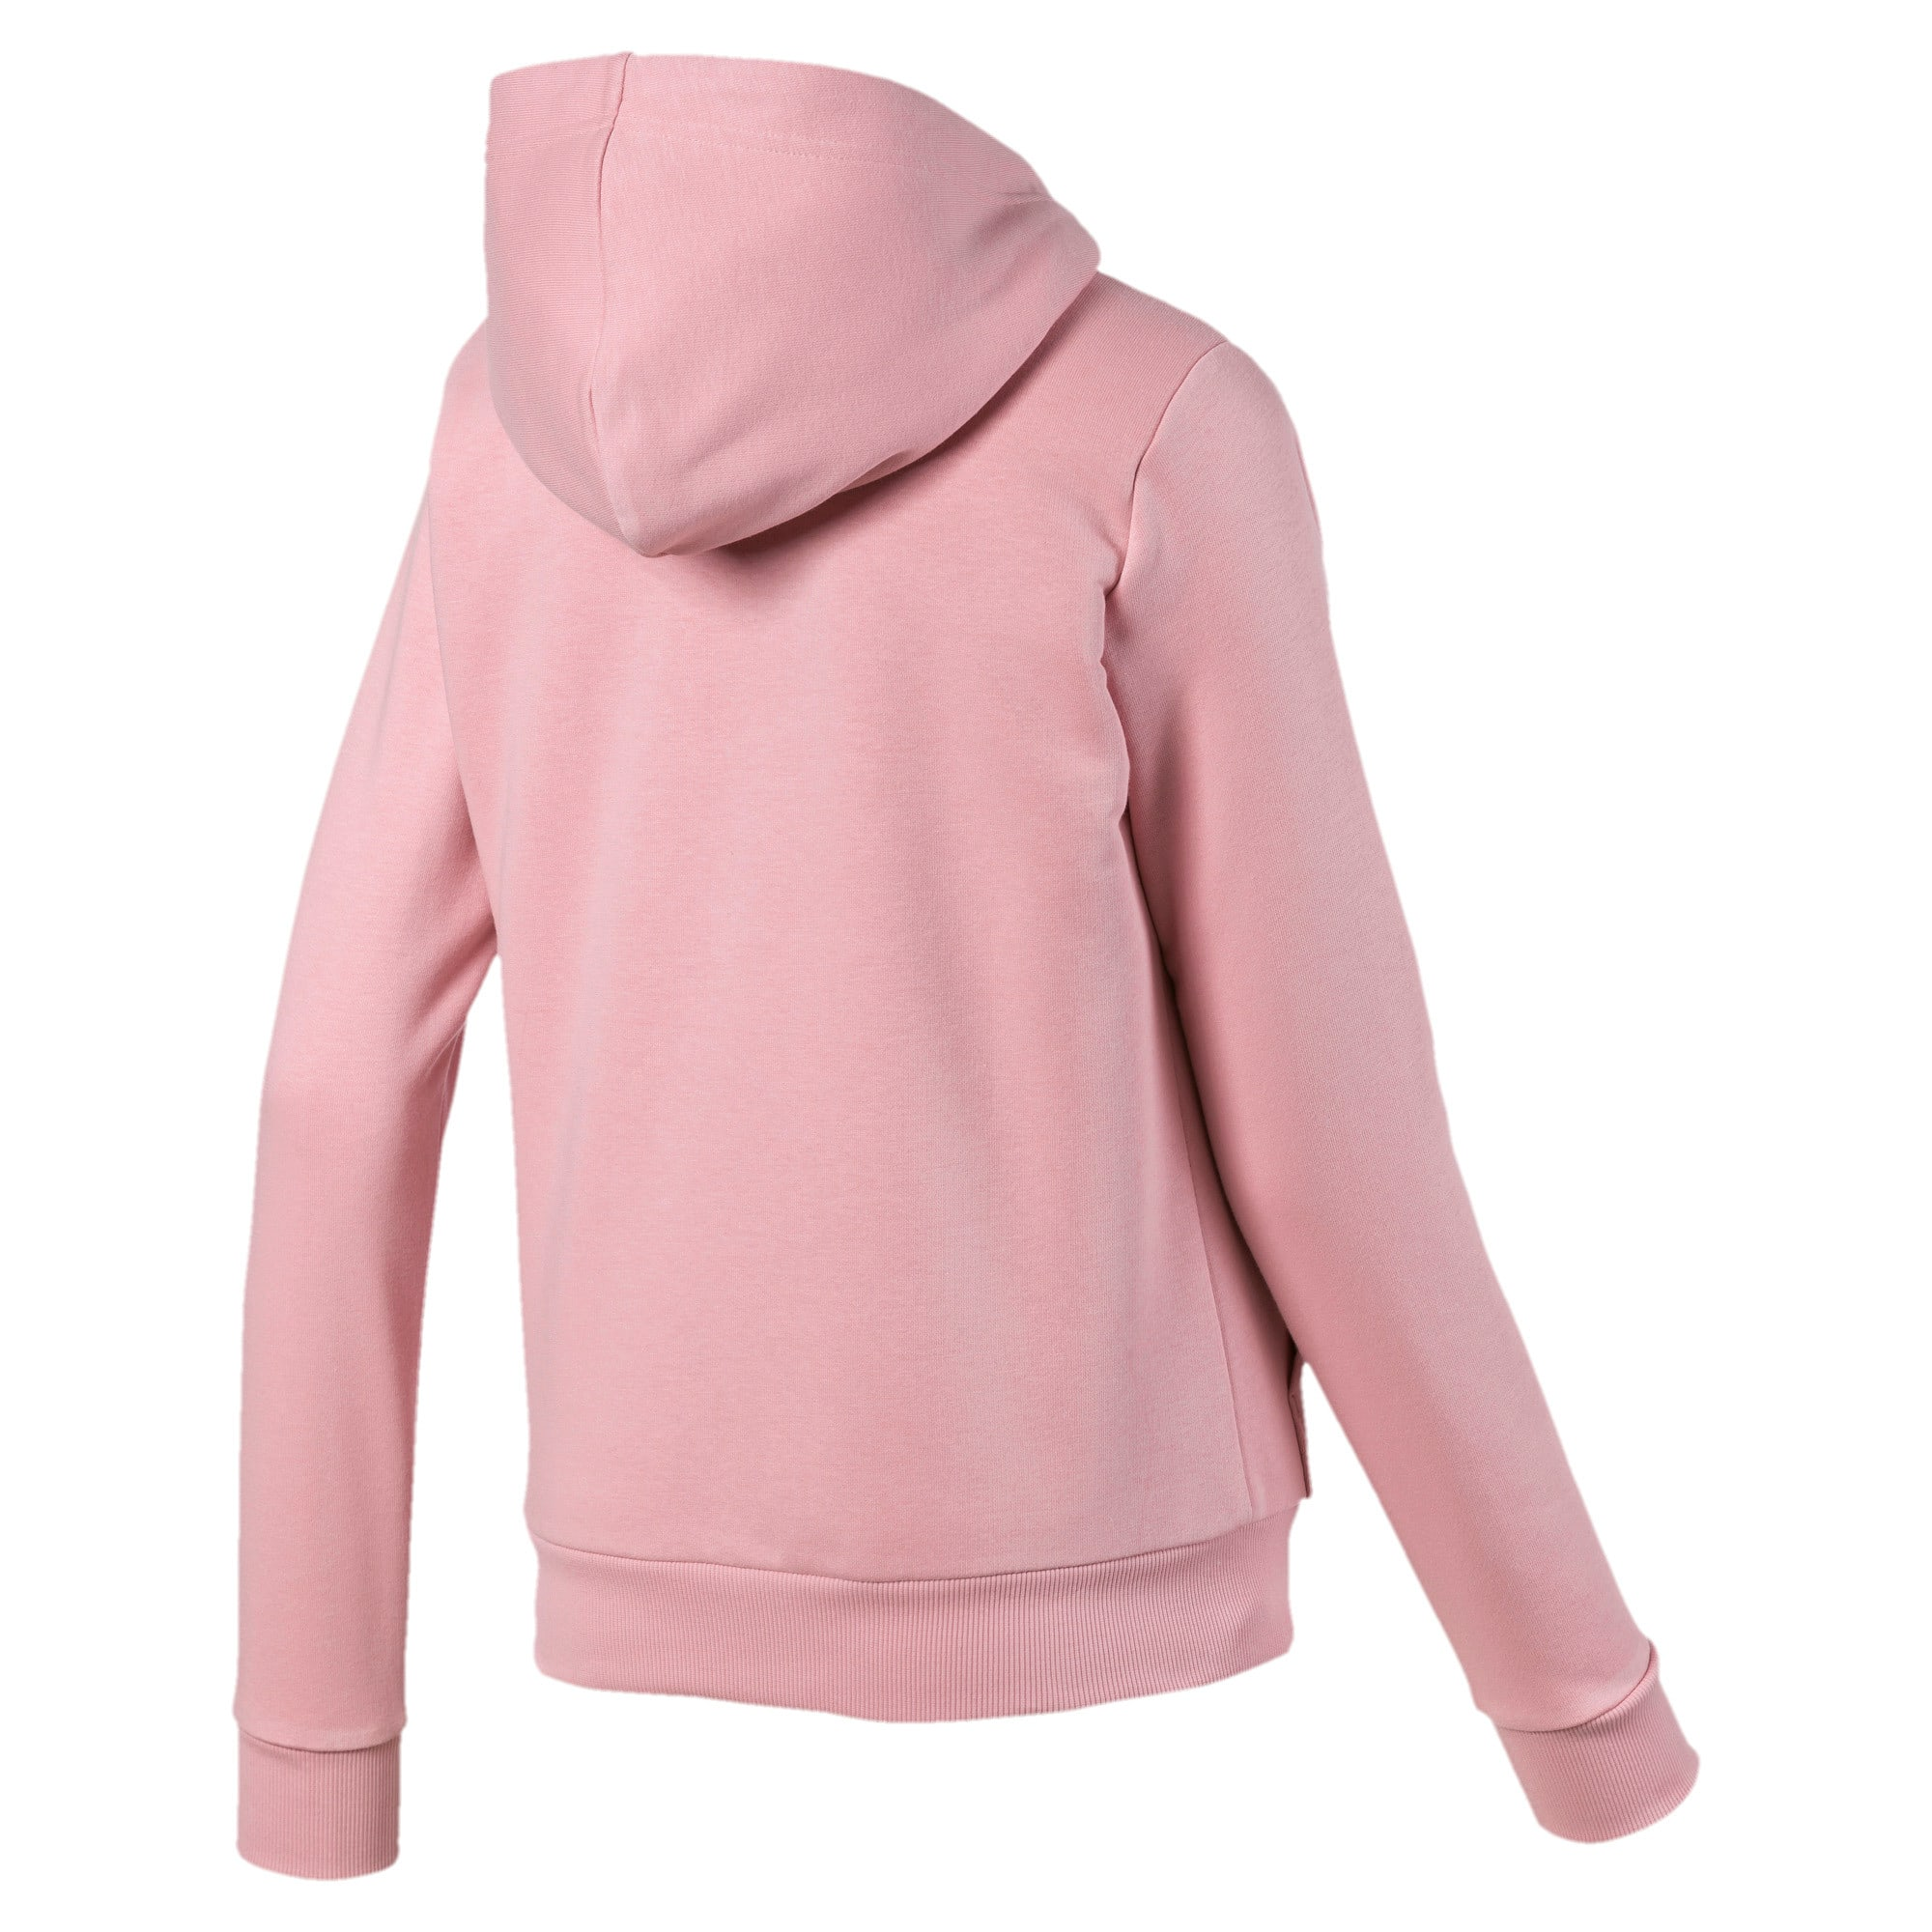 Thumbnail 5 of Essentials + Sherpa Women's Hooded Jacket, Bridal Rose, medium